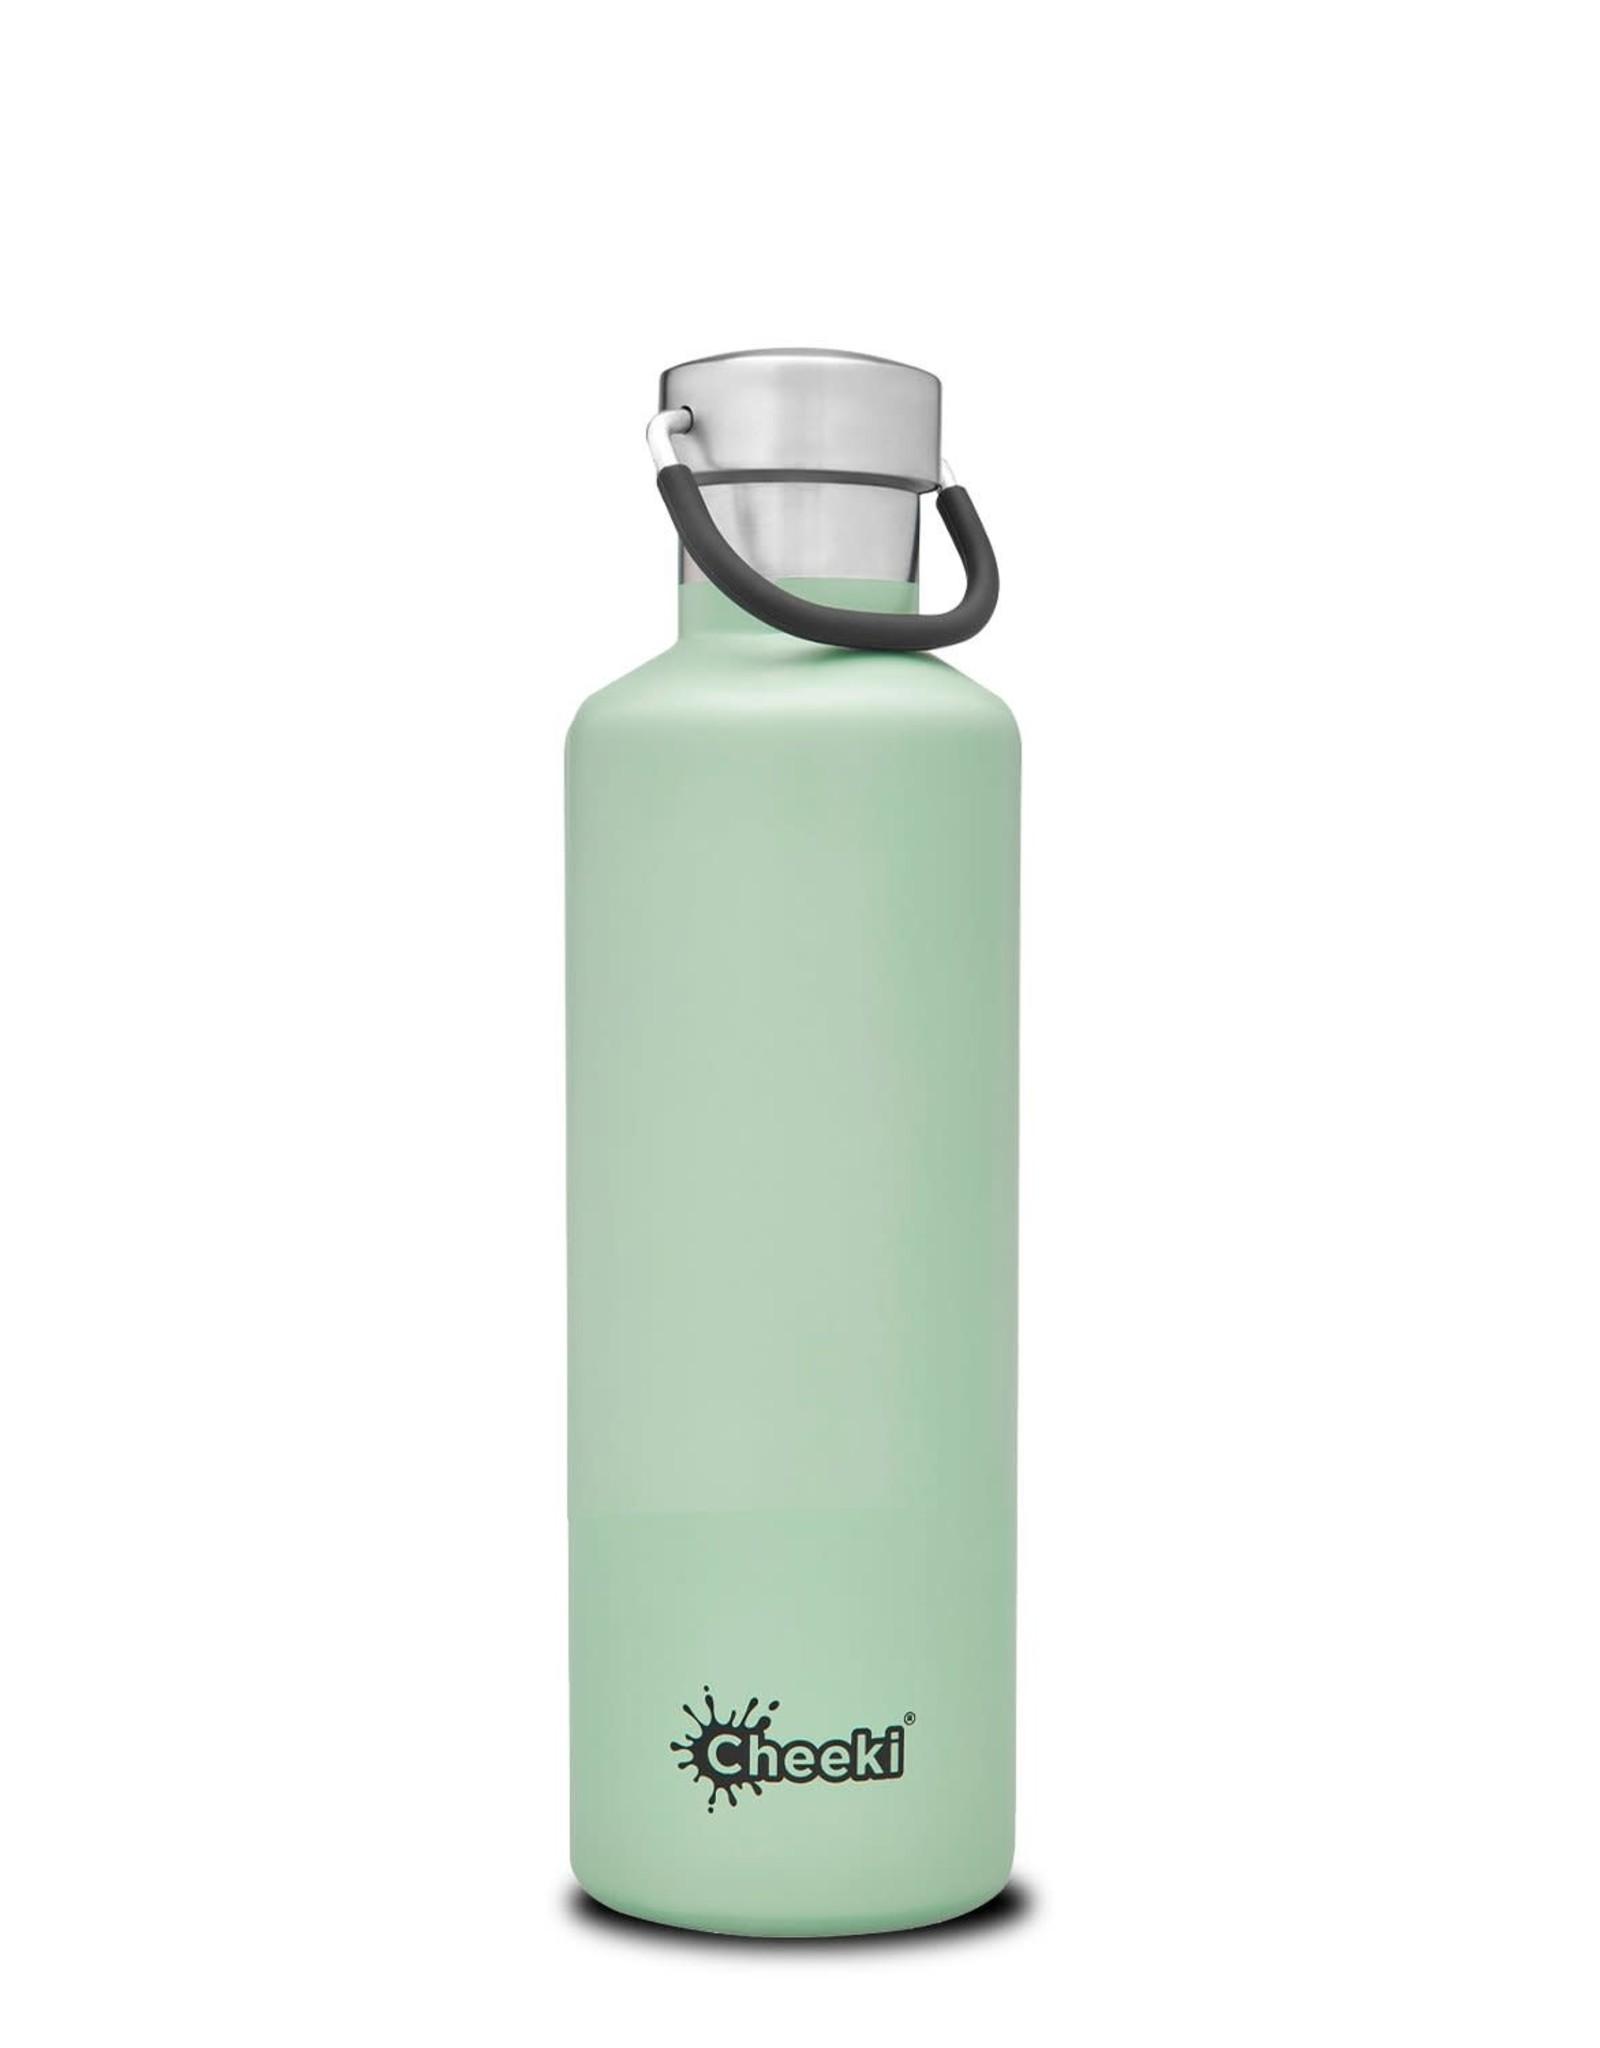 Cheeki Stainless Steel Water Bottle Insulated - 600ml